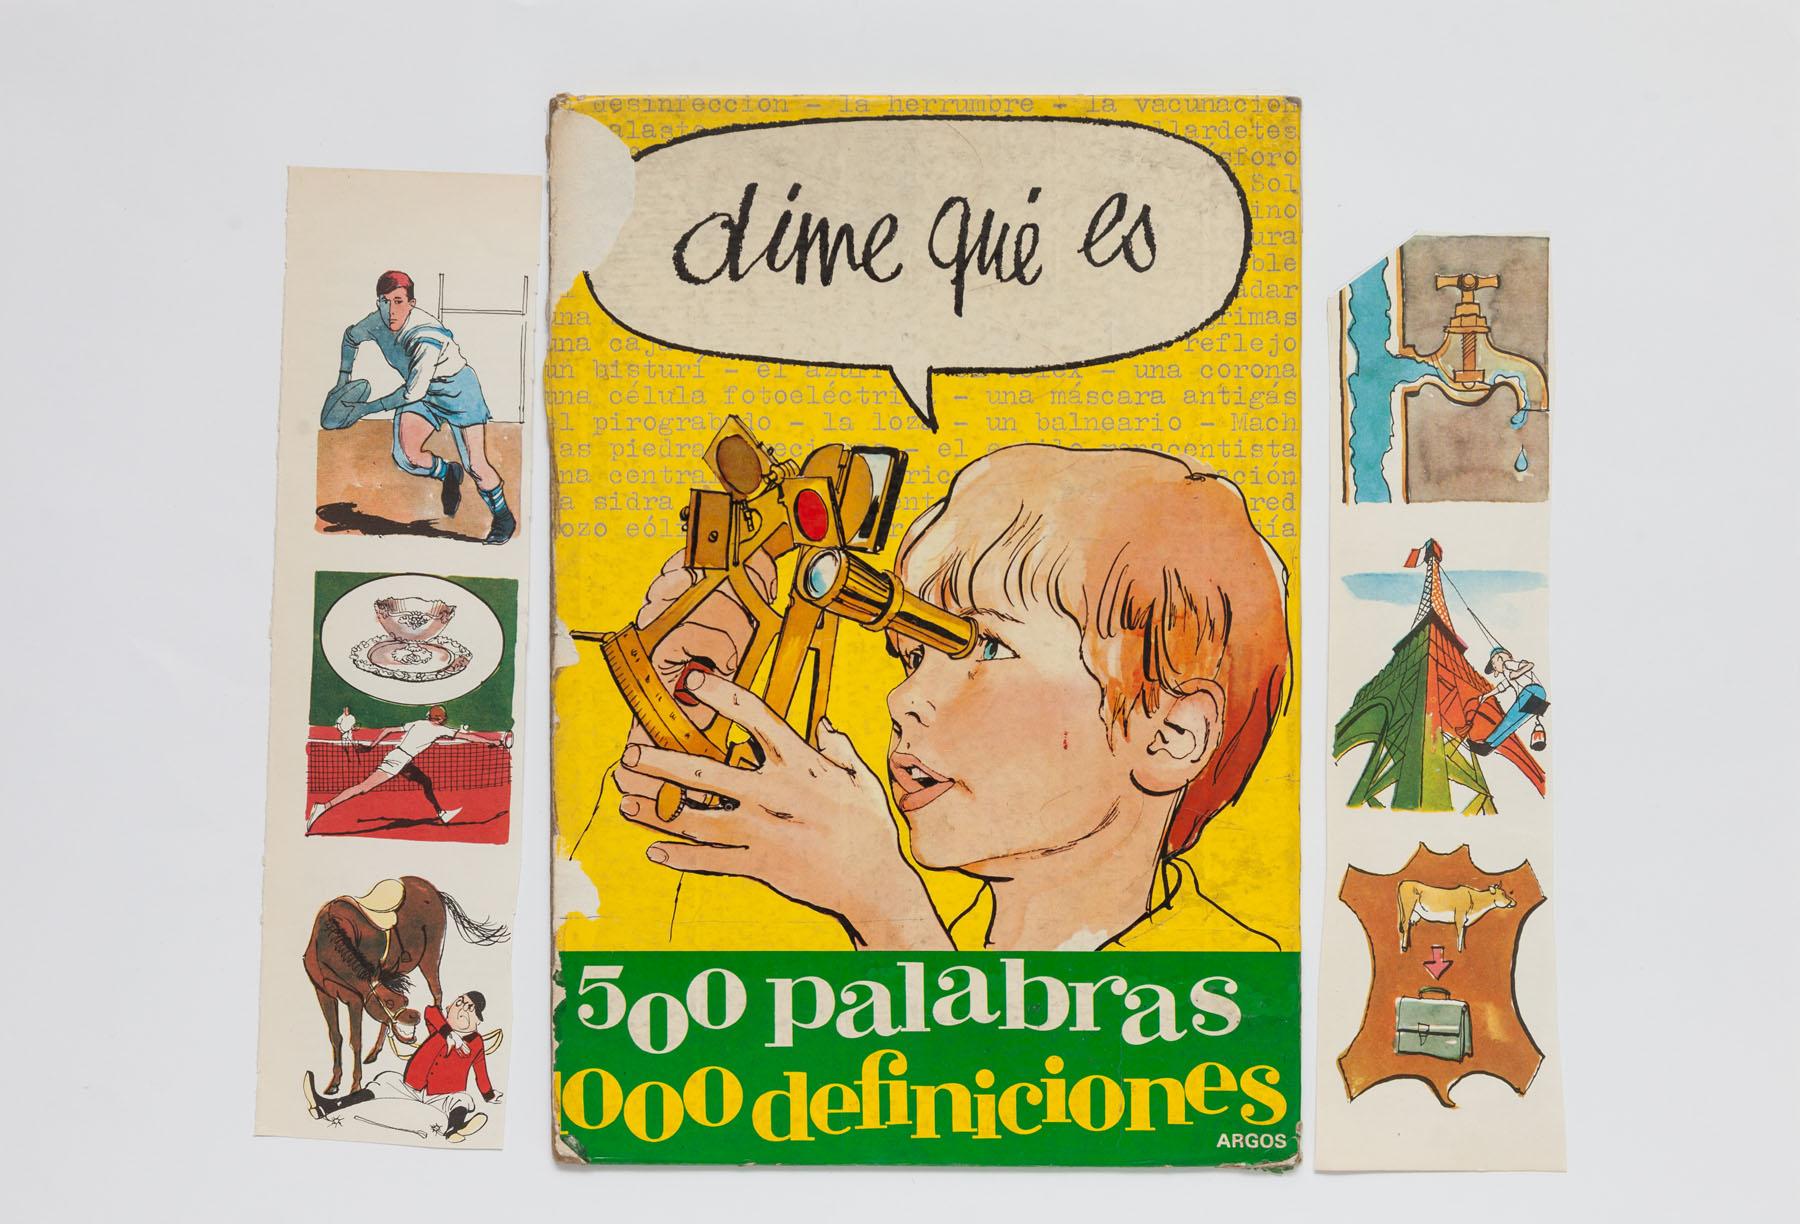 Serie Cuarentena, papel collage, 32 cm x 47 cm, 2020